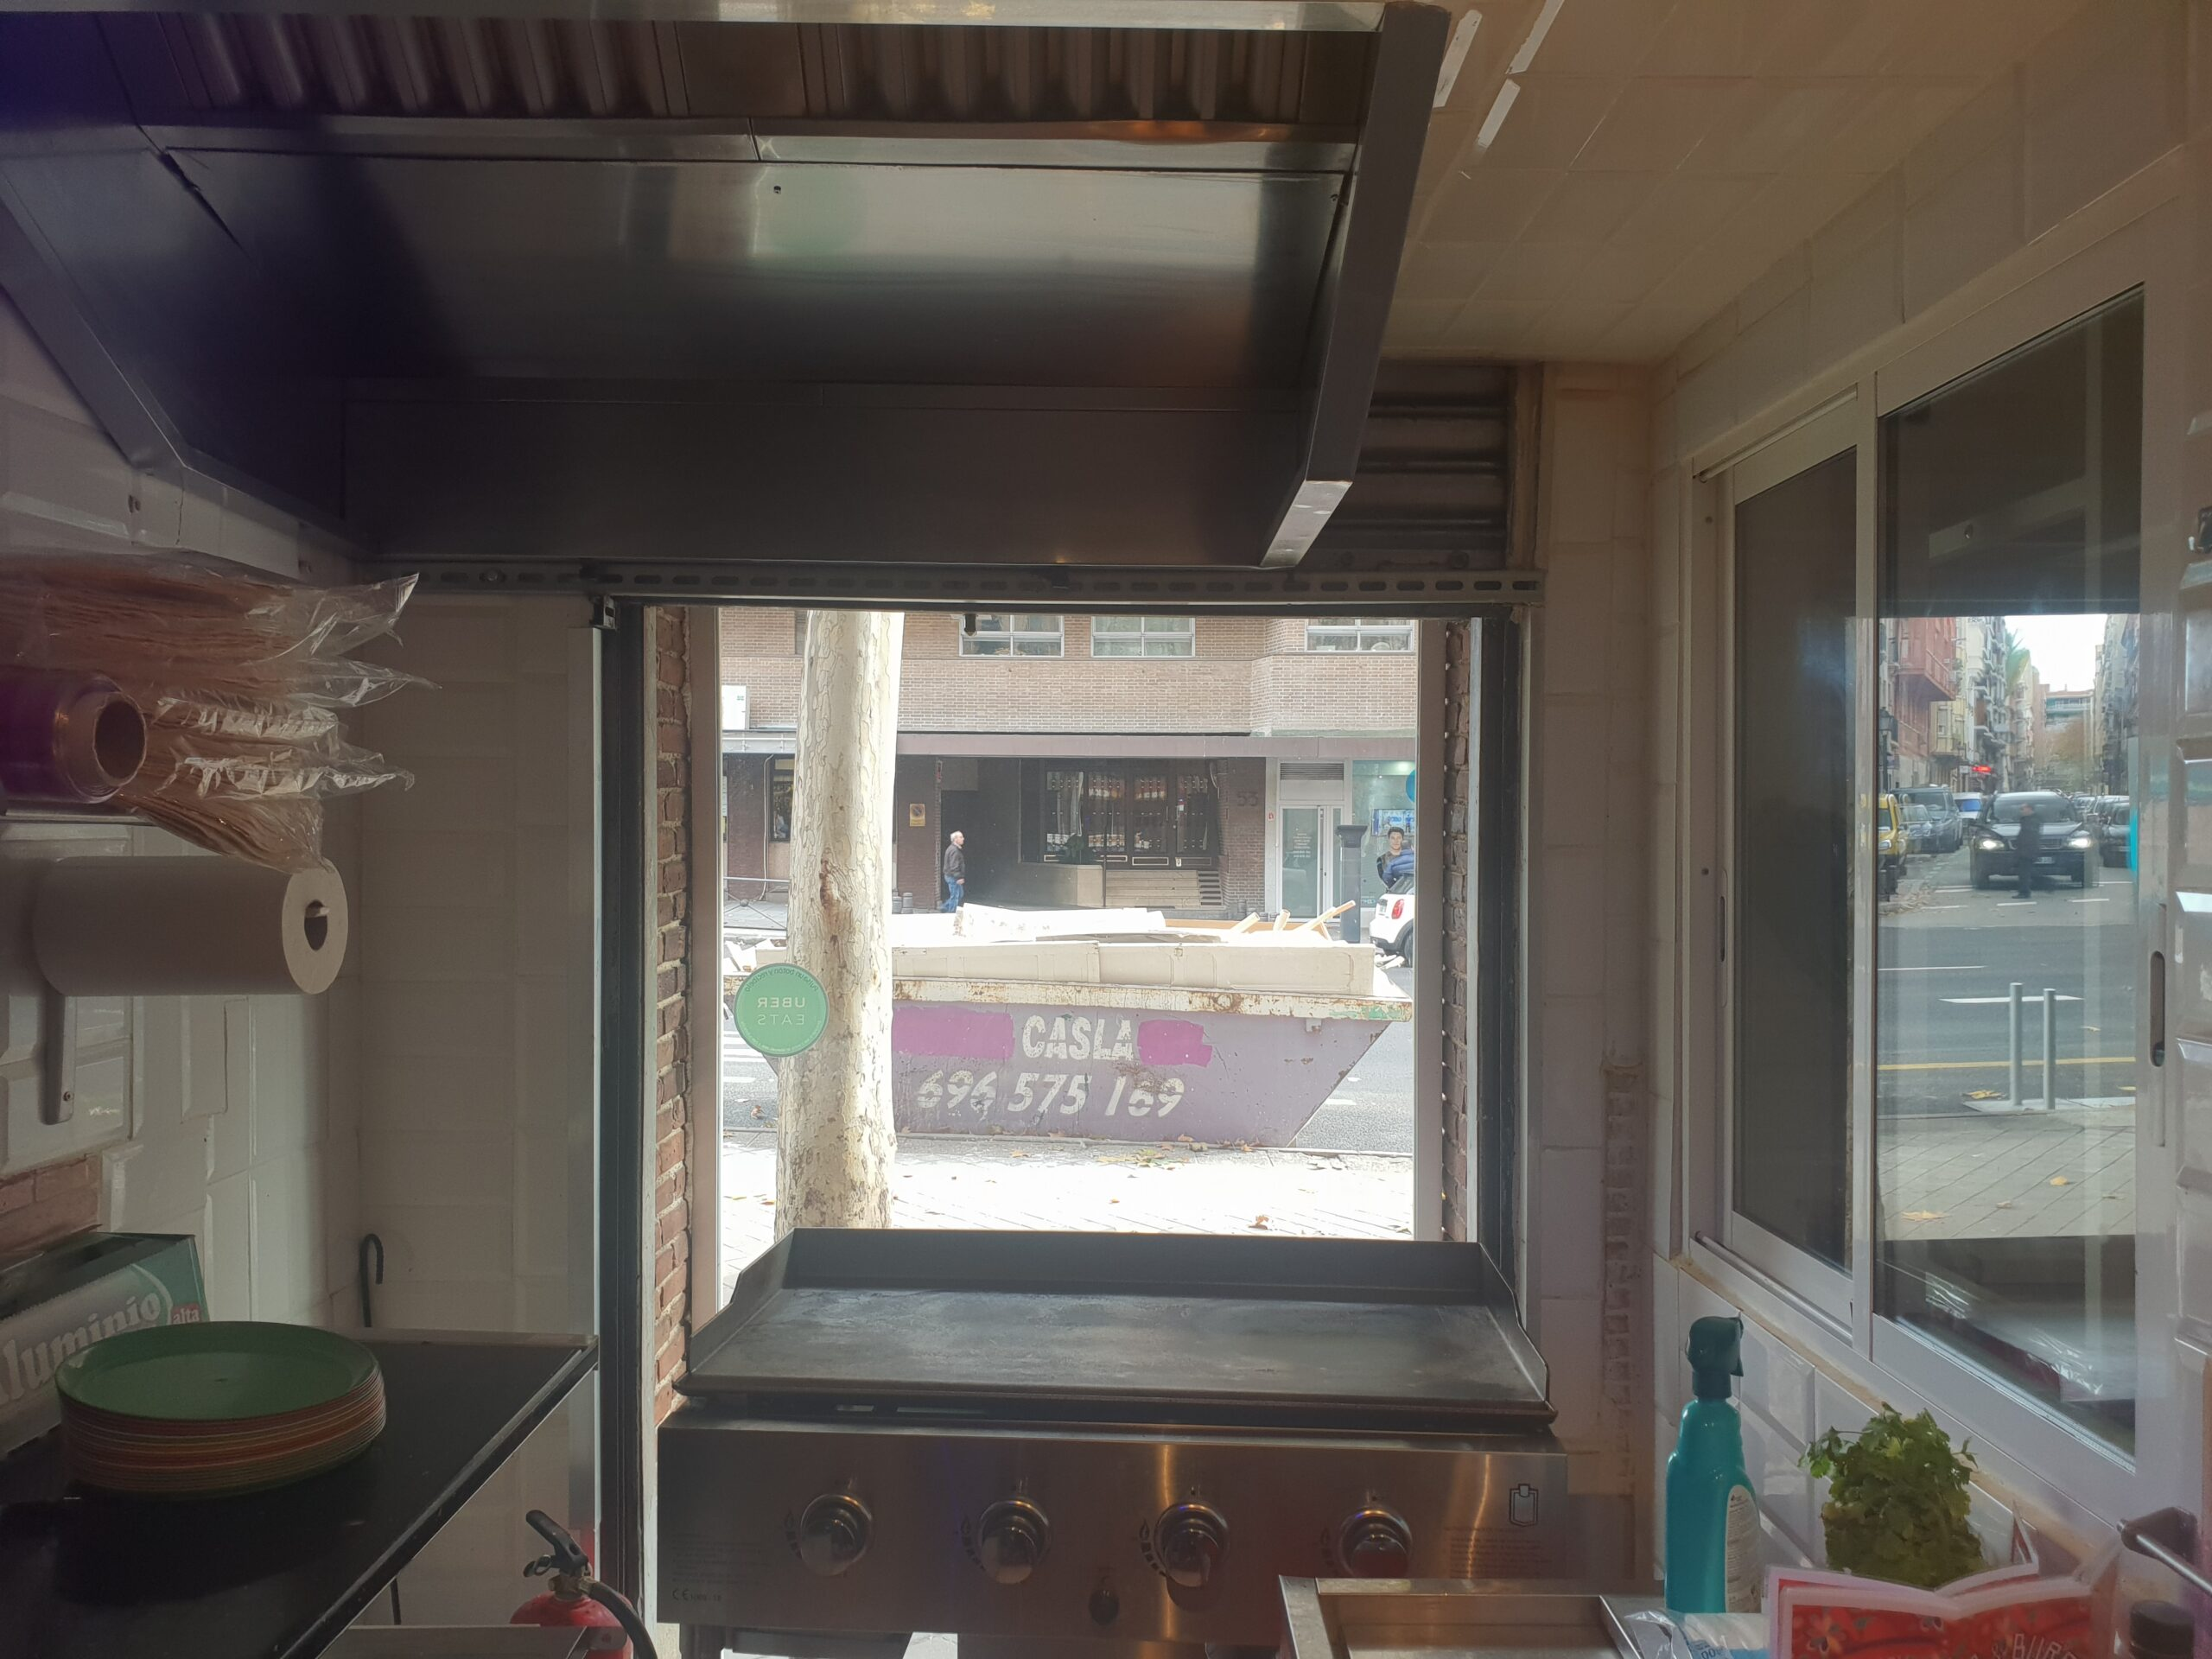 Embajadores – Se  traspasa Bar/Restaurante de 50 m2